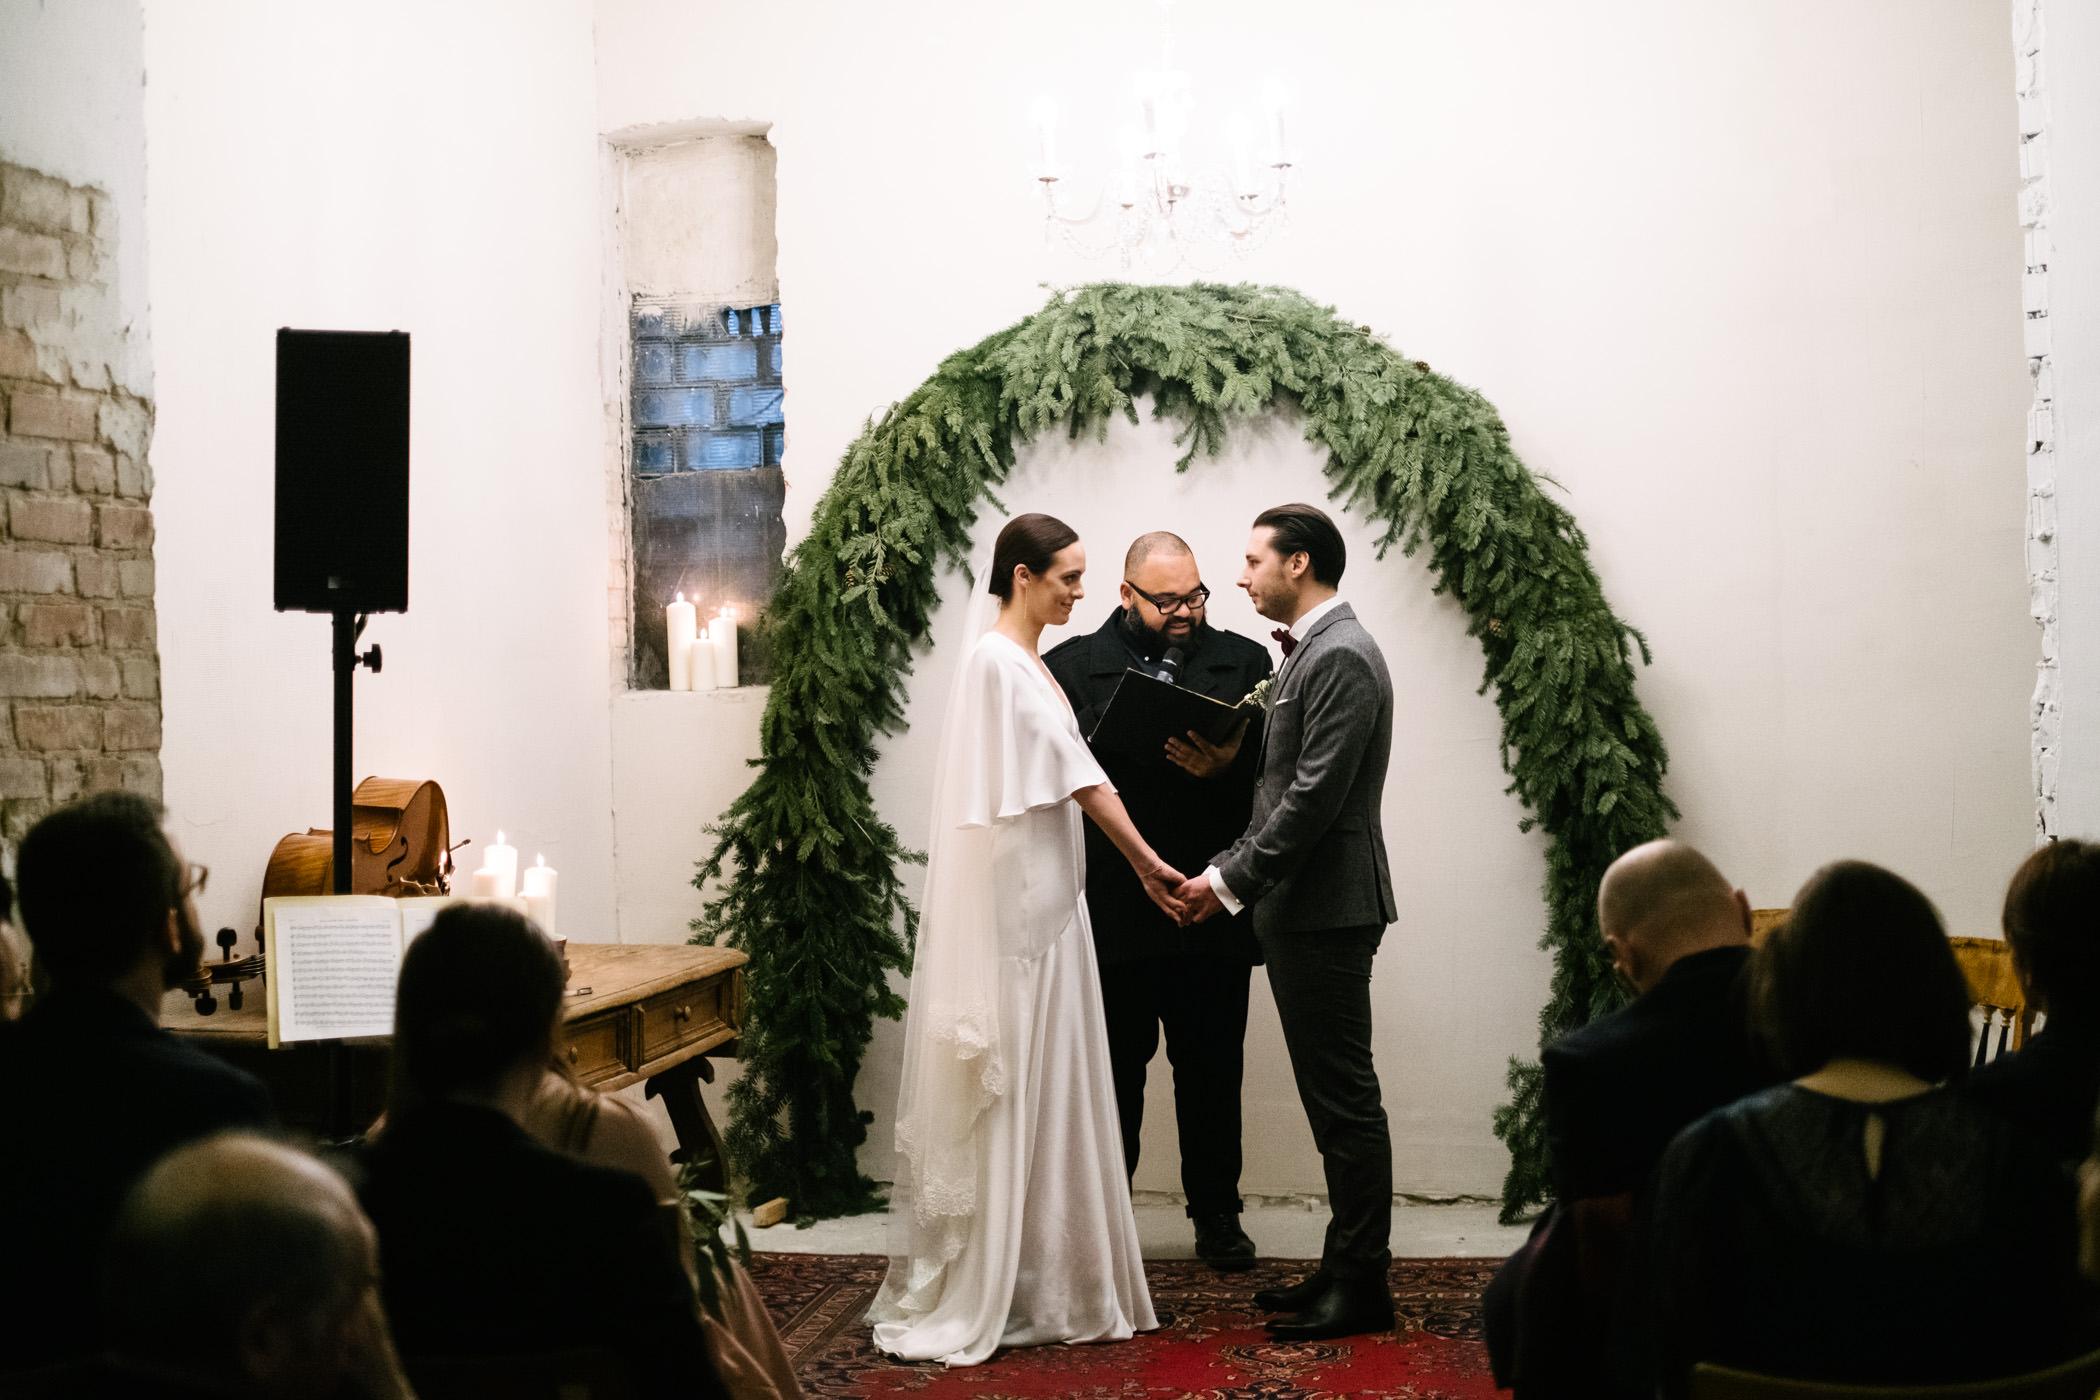 Ceremony-66.jpg